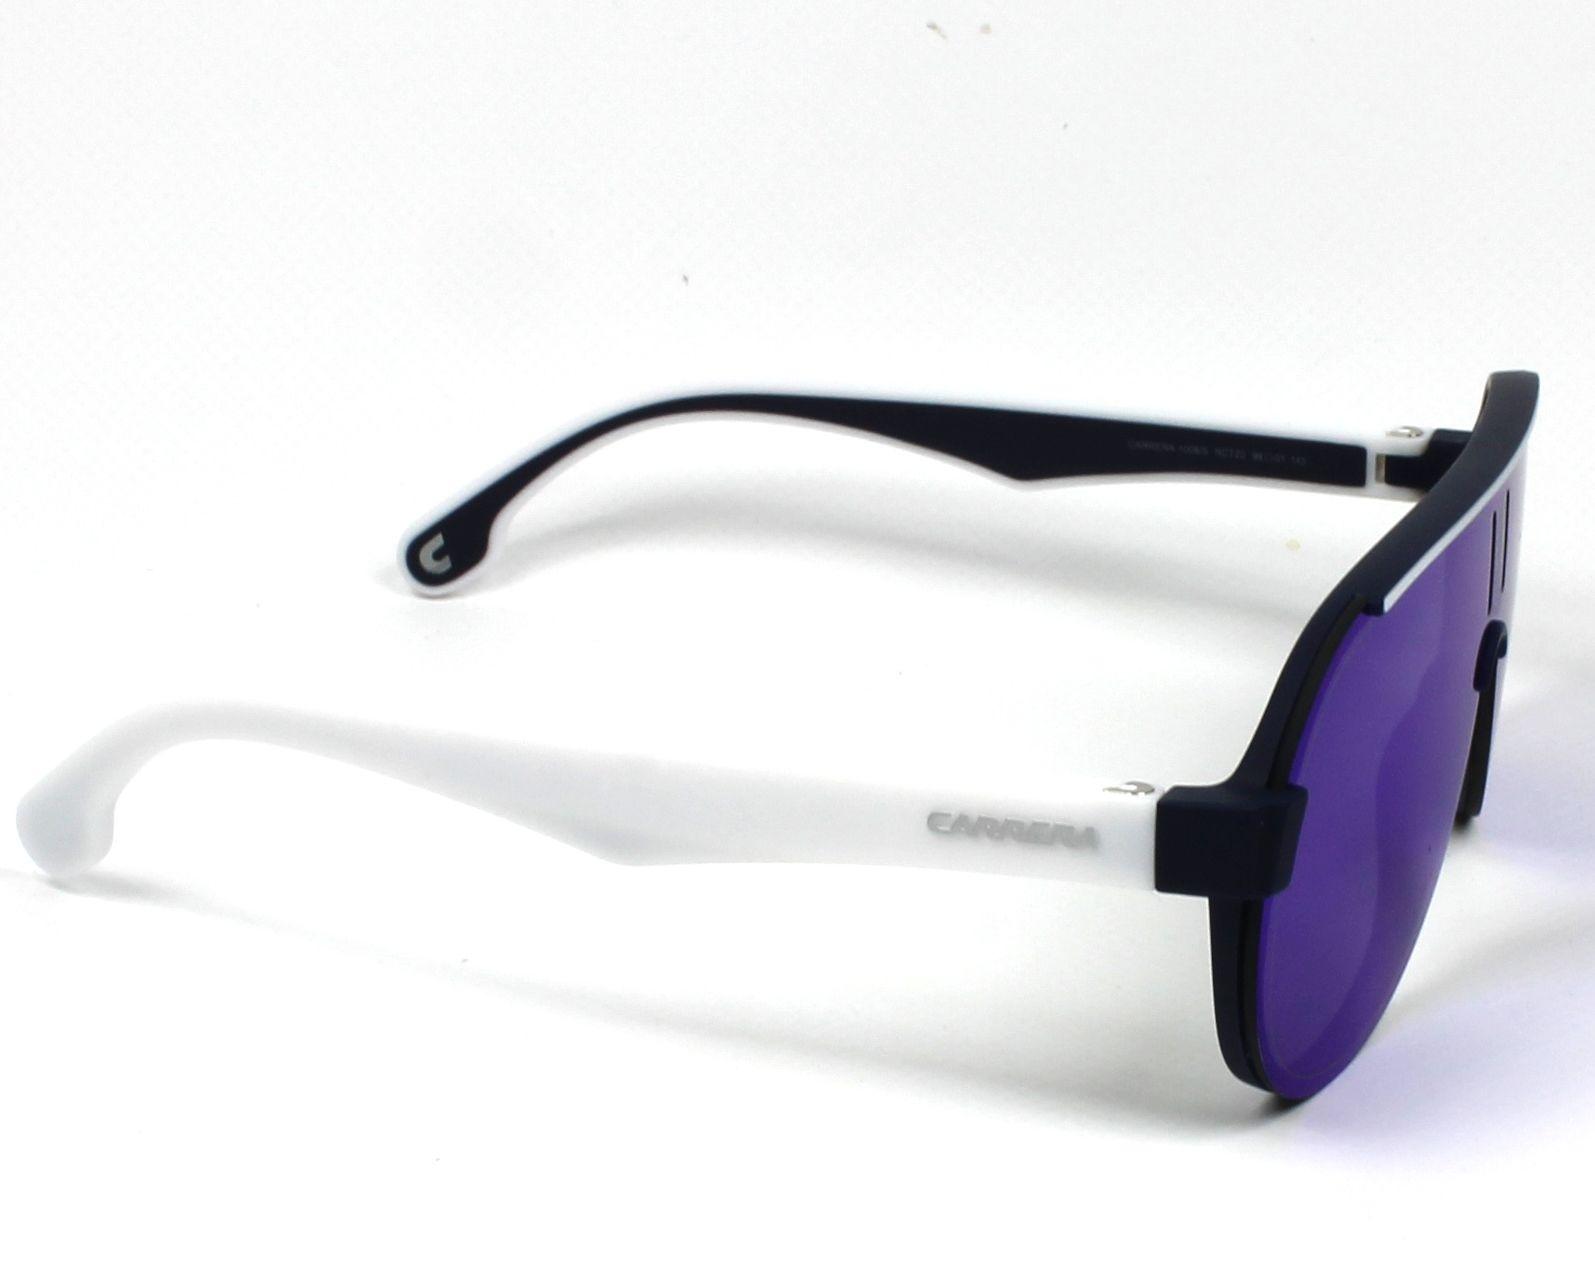 5b8839d6b1aa0 Sunglasses Carrera 1008-S RCT Z0 99- Blue White side view